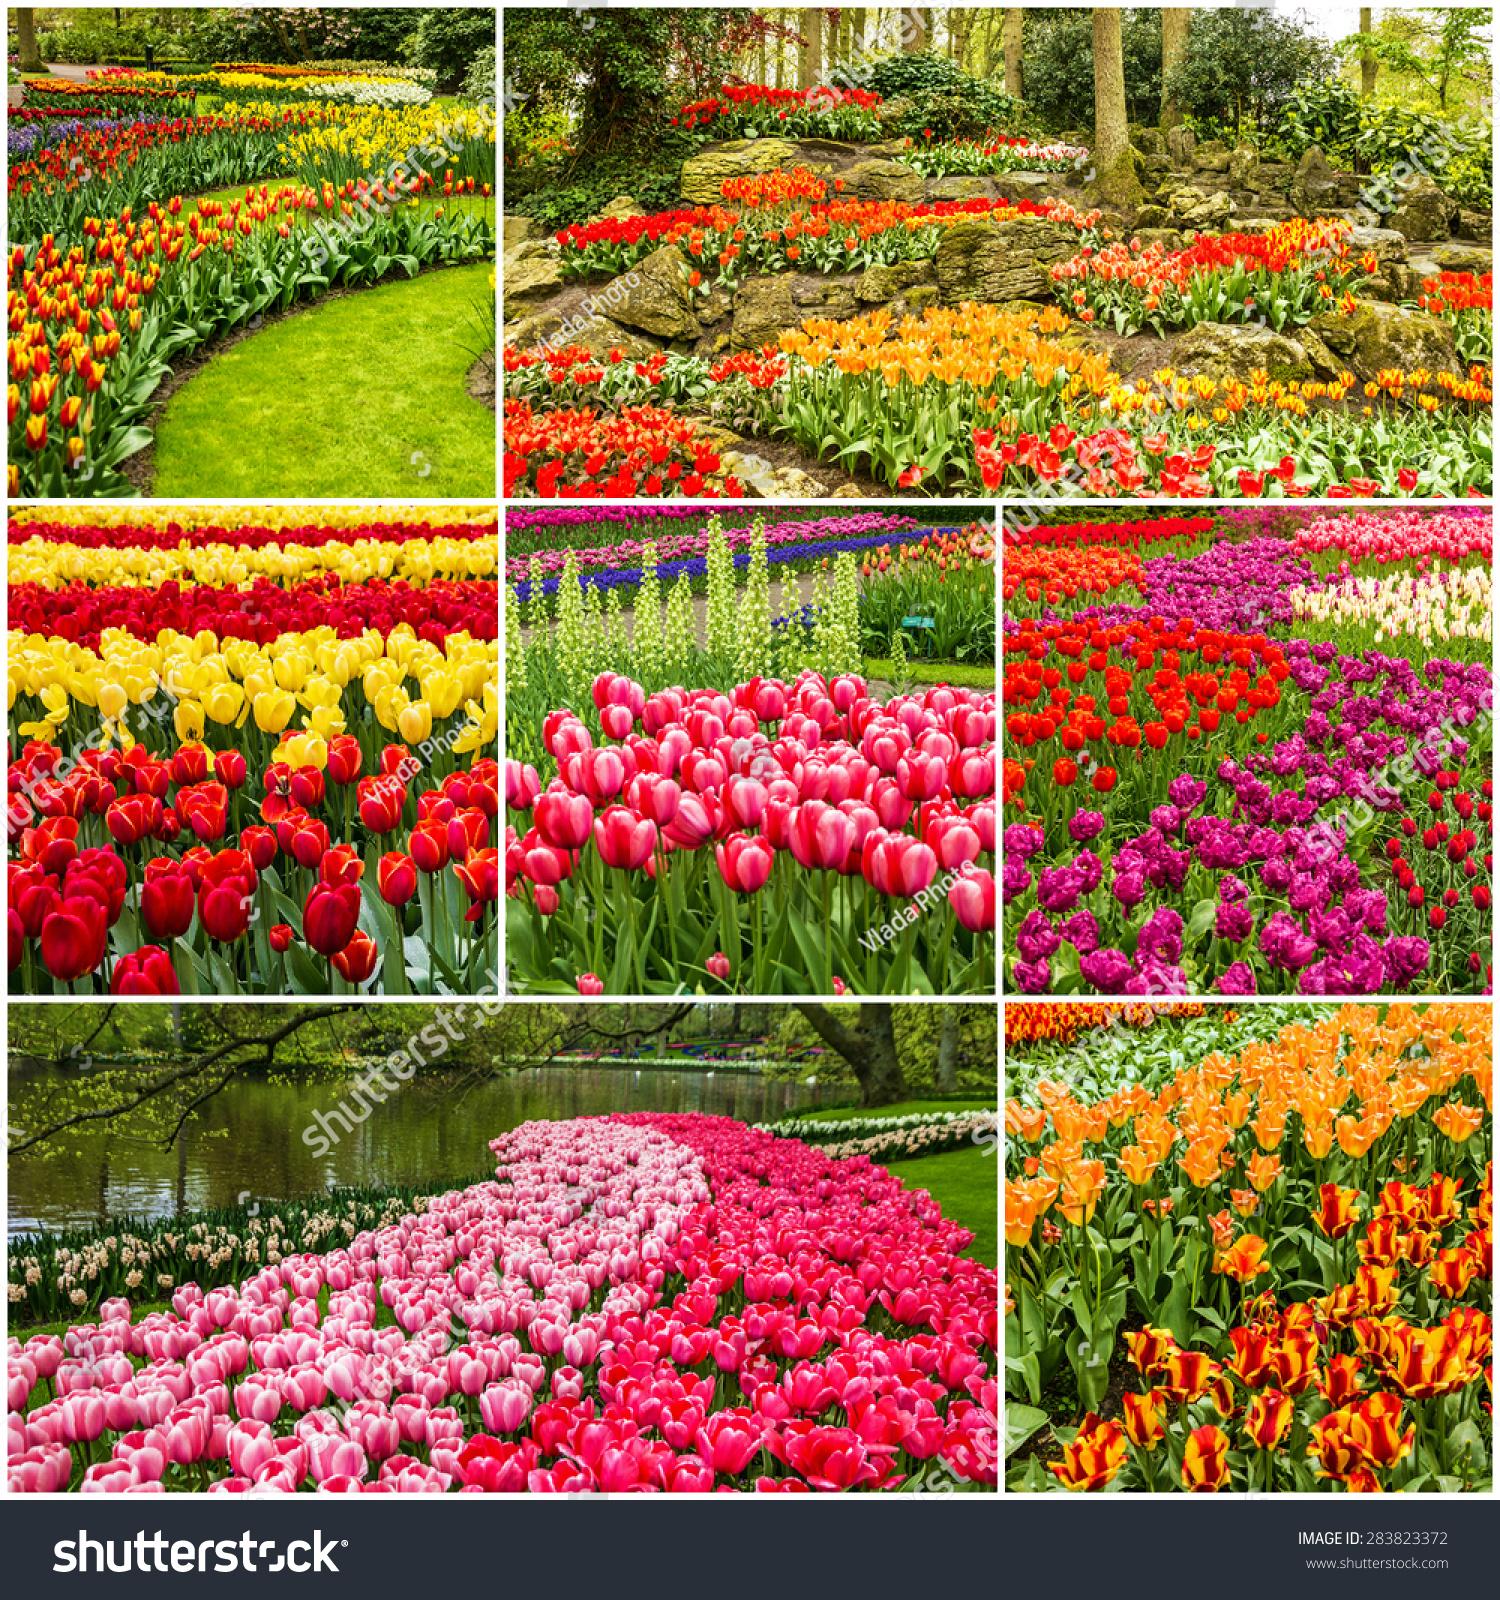 Tulip Amsterdam Keukenhof: Tulips Collage Keukenhof Flower Park Holland Stock Photo